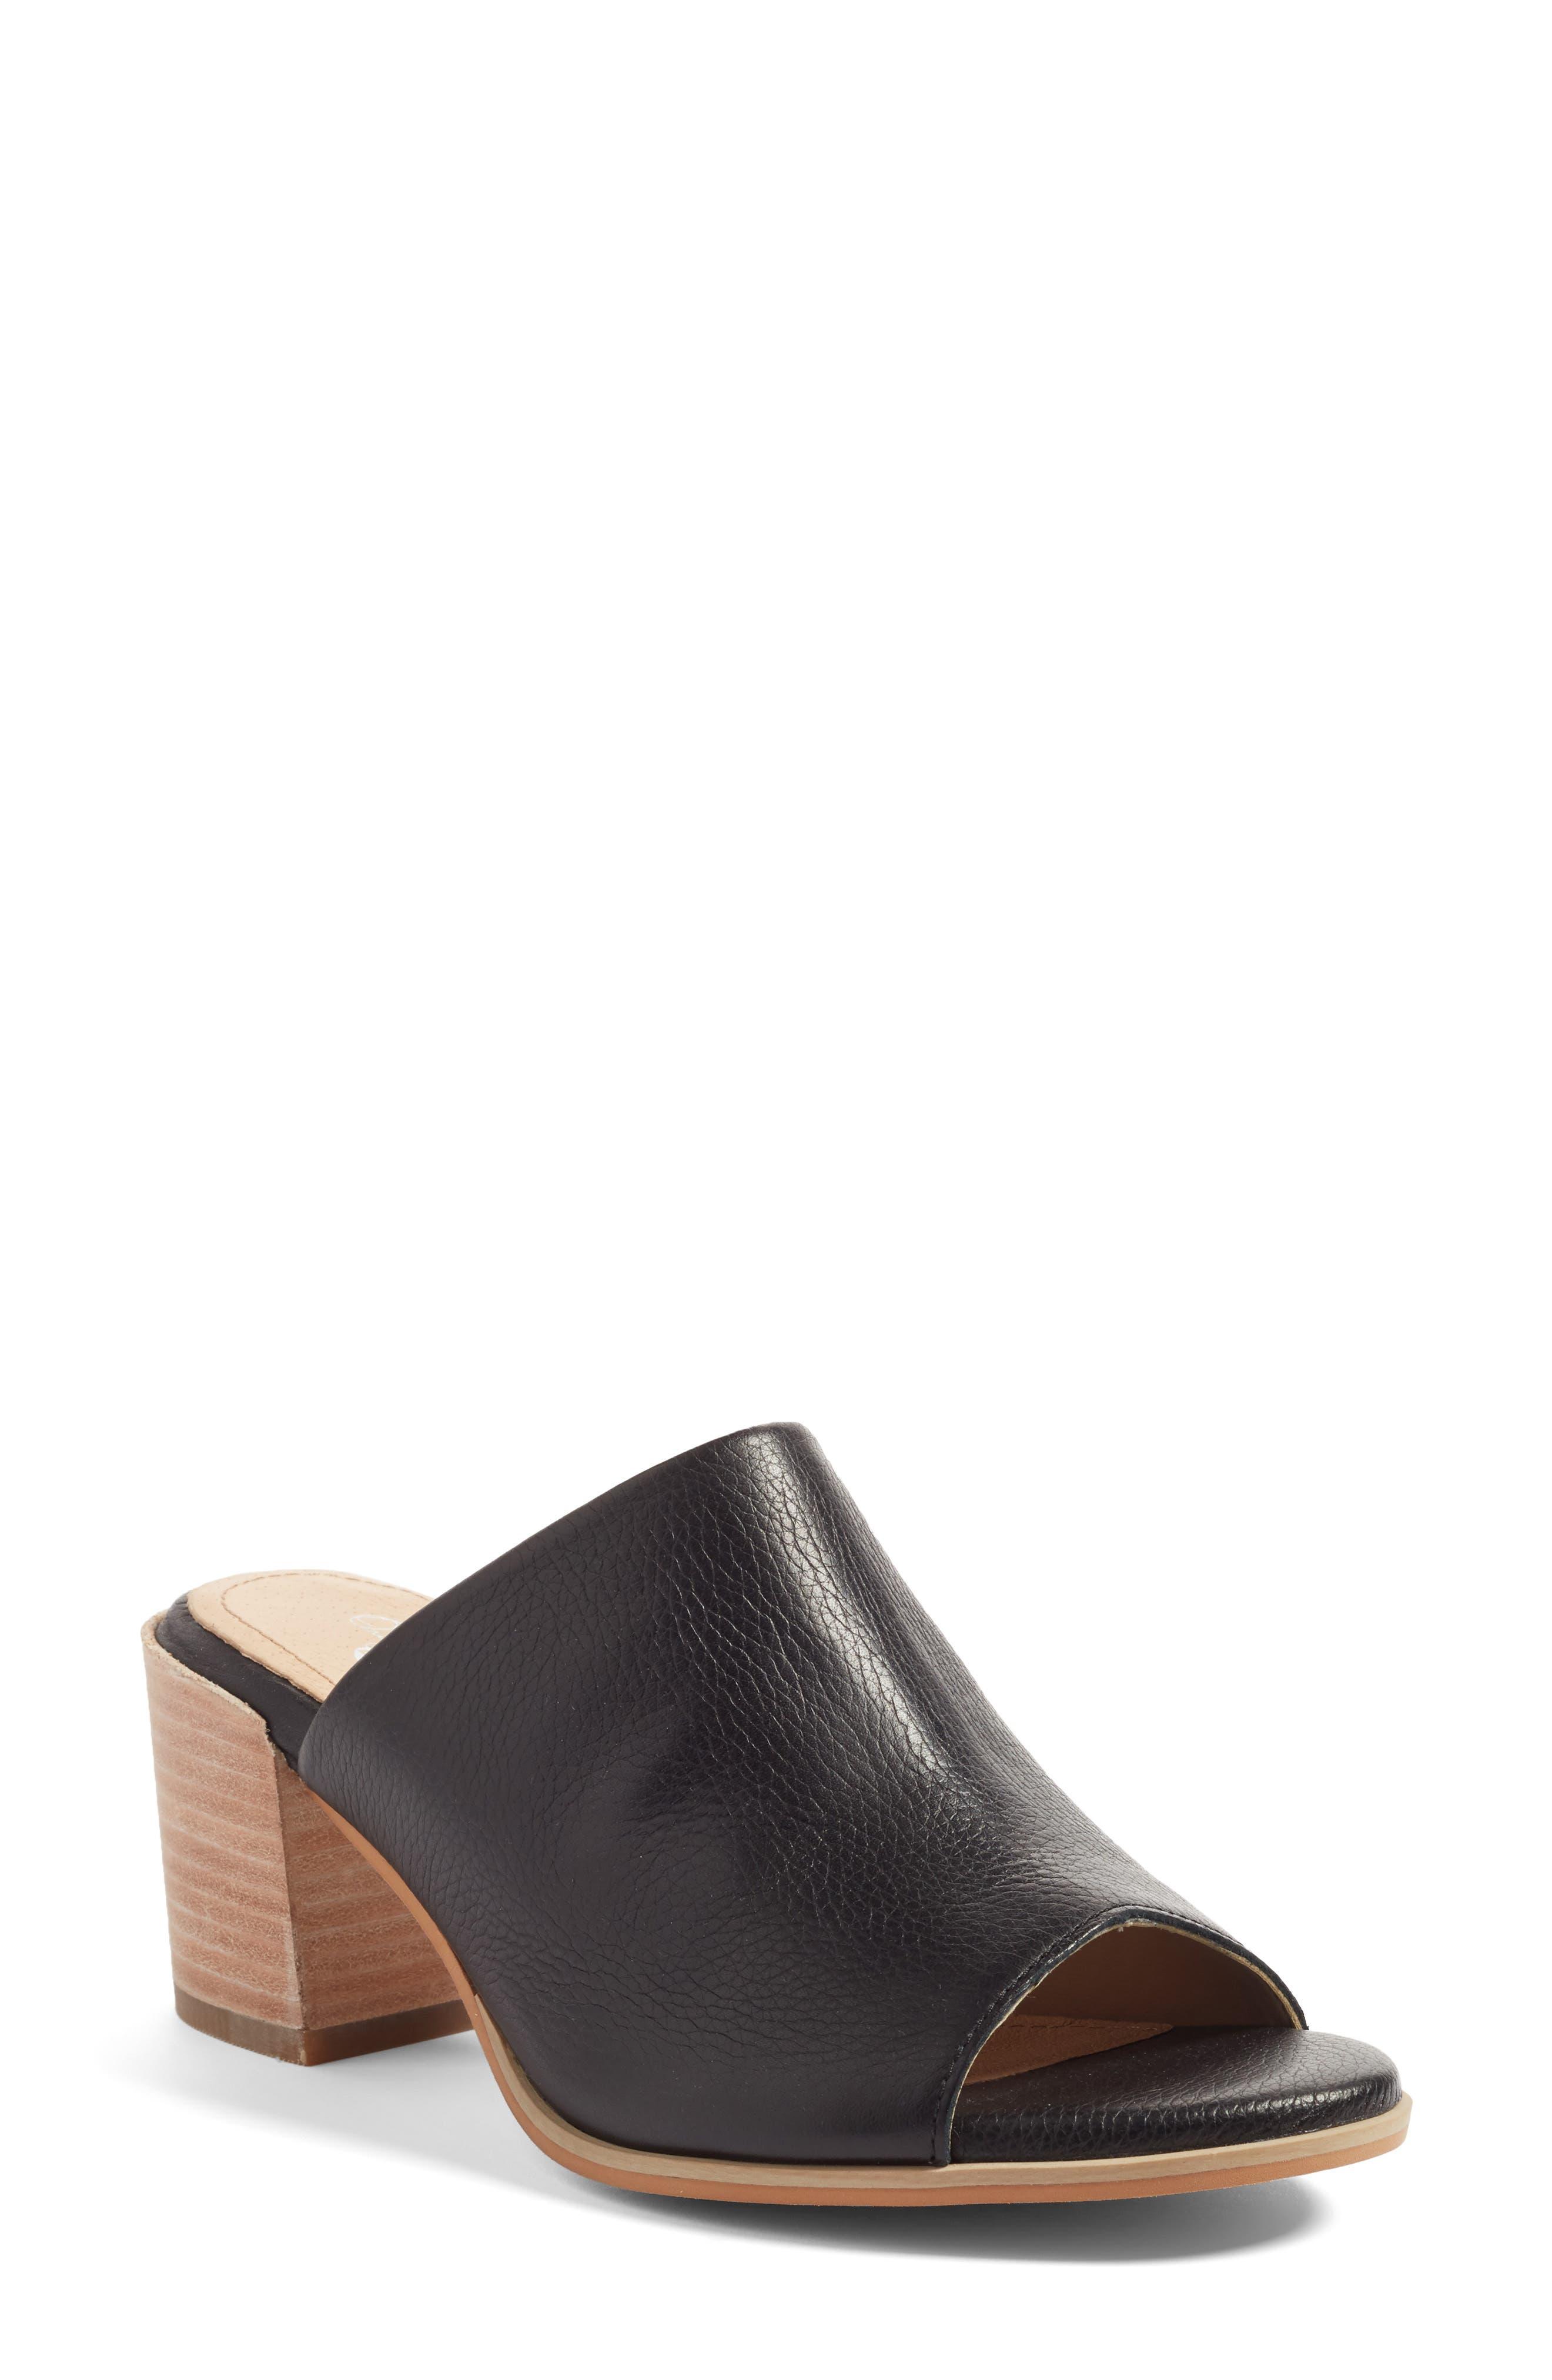 Malin Block Heel Sandal,                         Main,                         color, 001